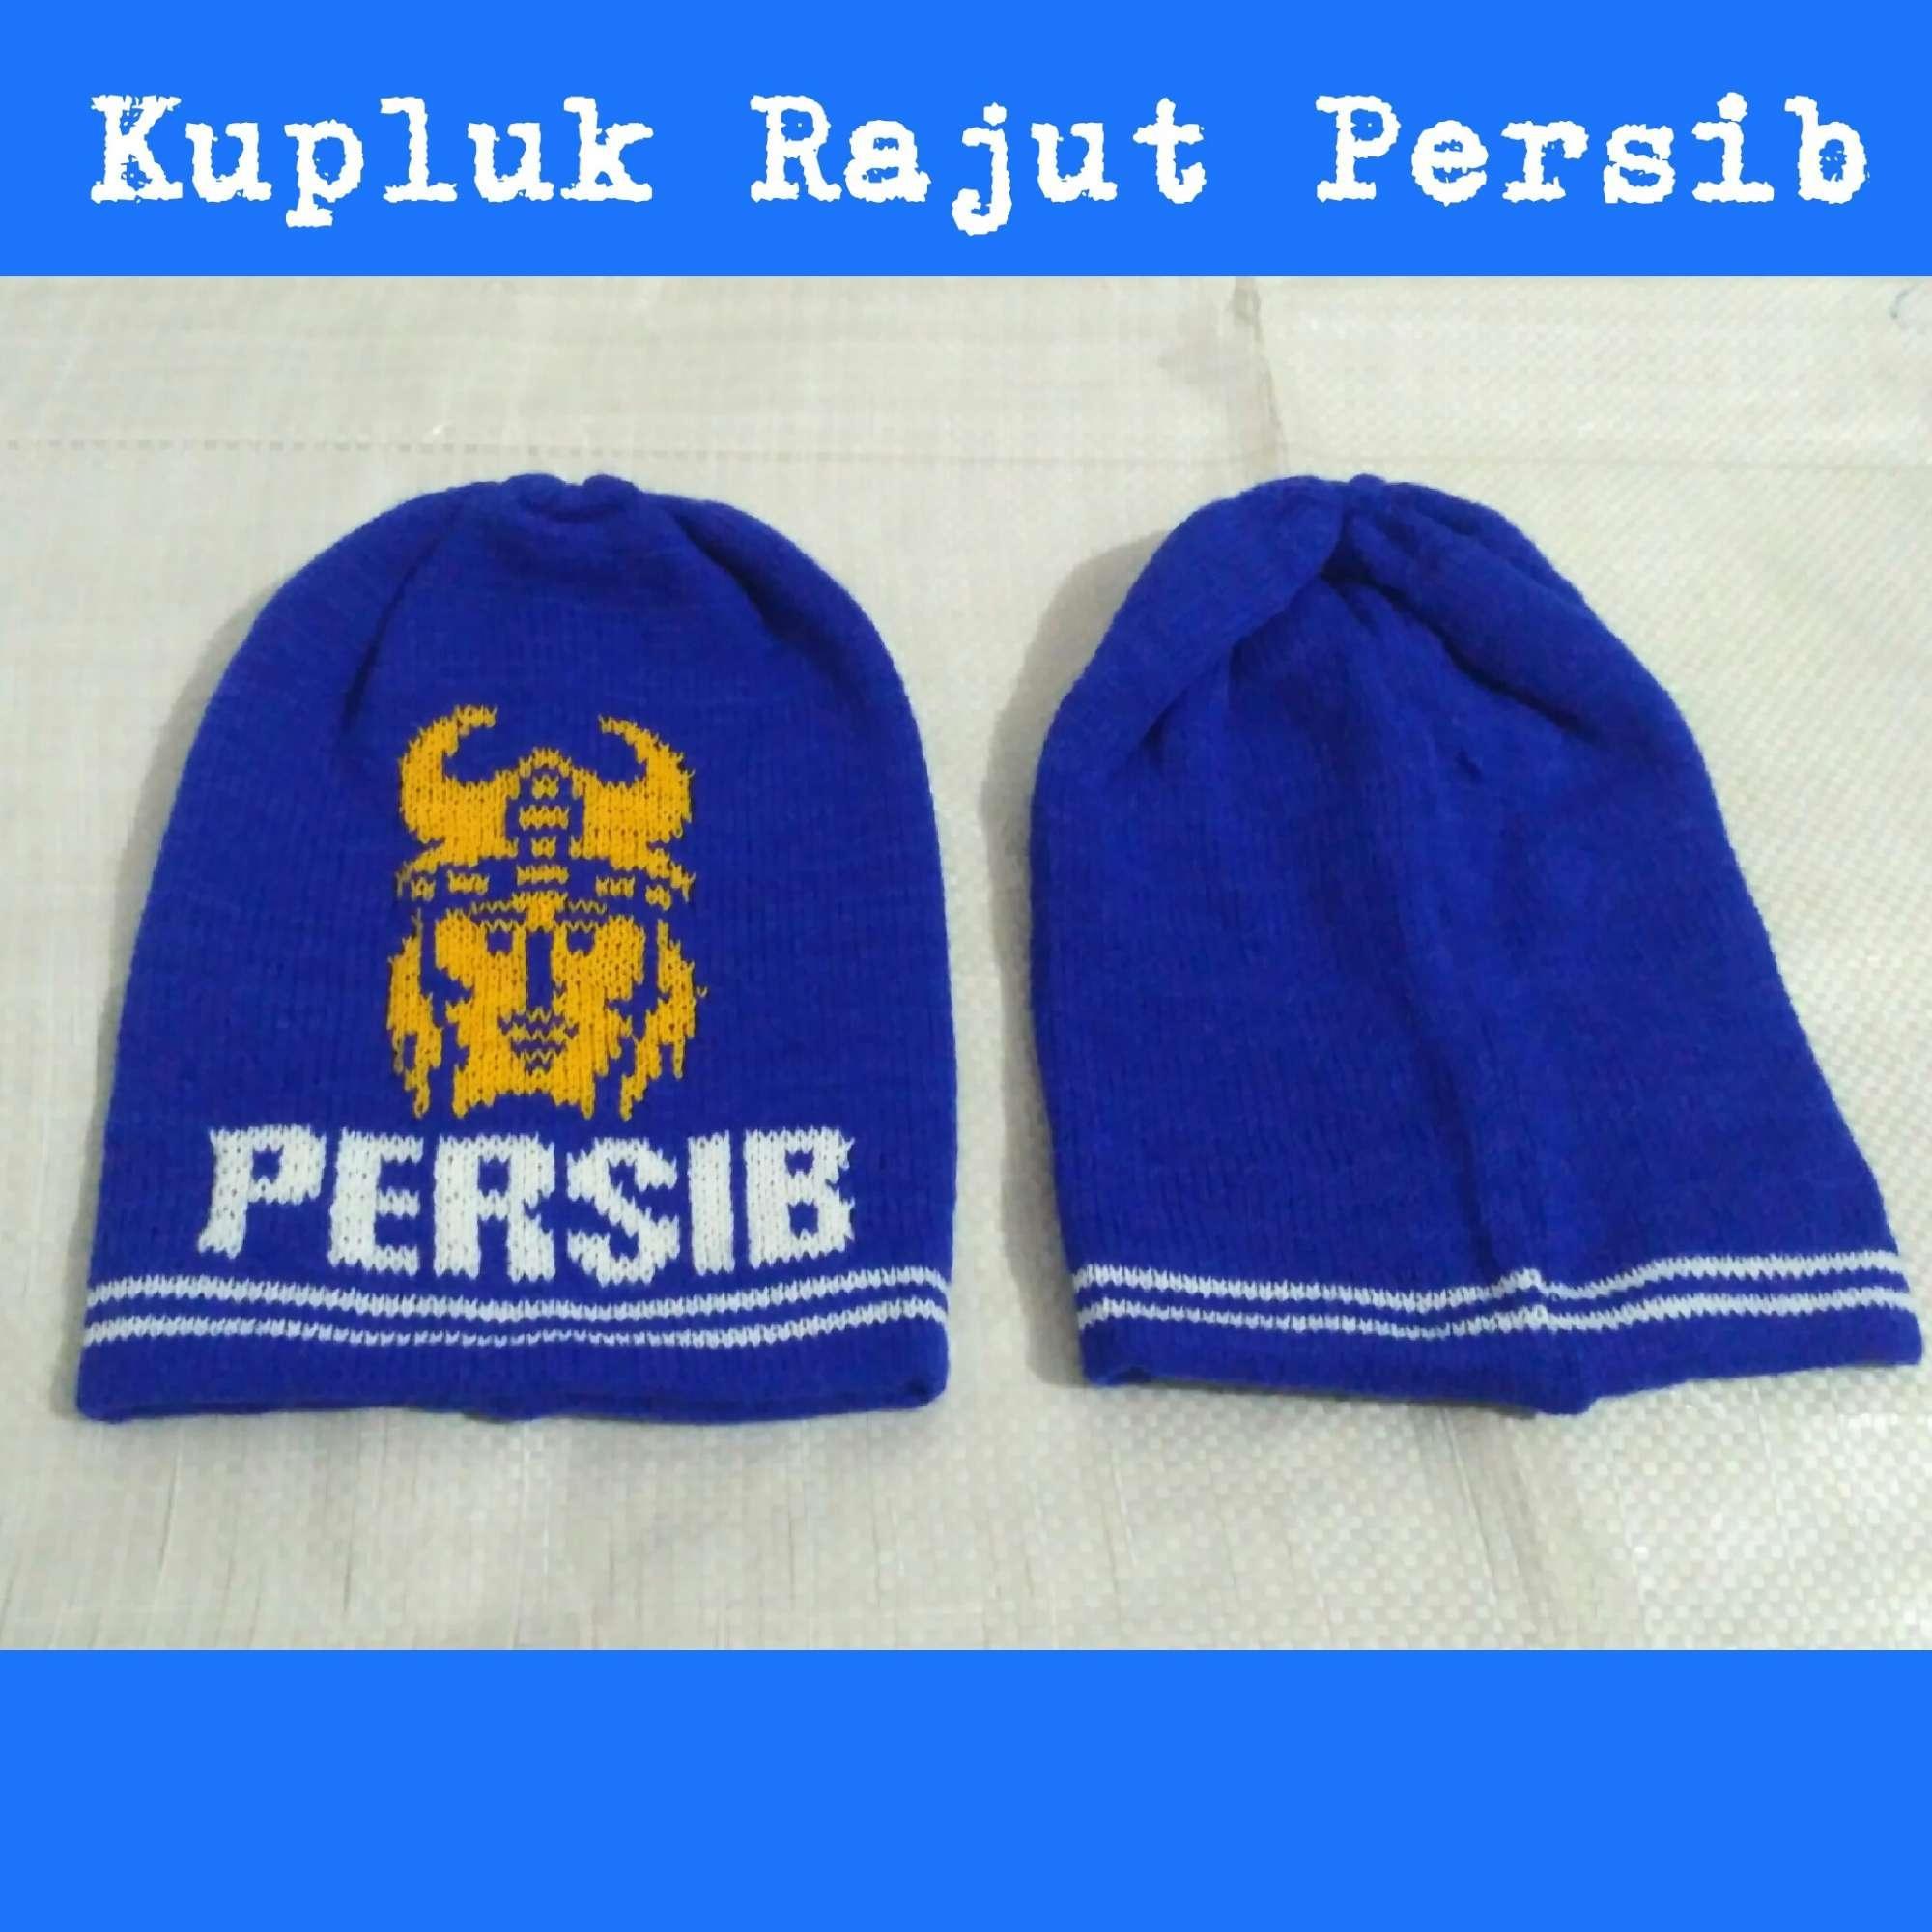 Kupluk Rajut Persib Bandung By Df Store Bgr.